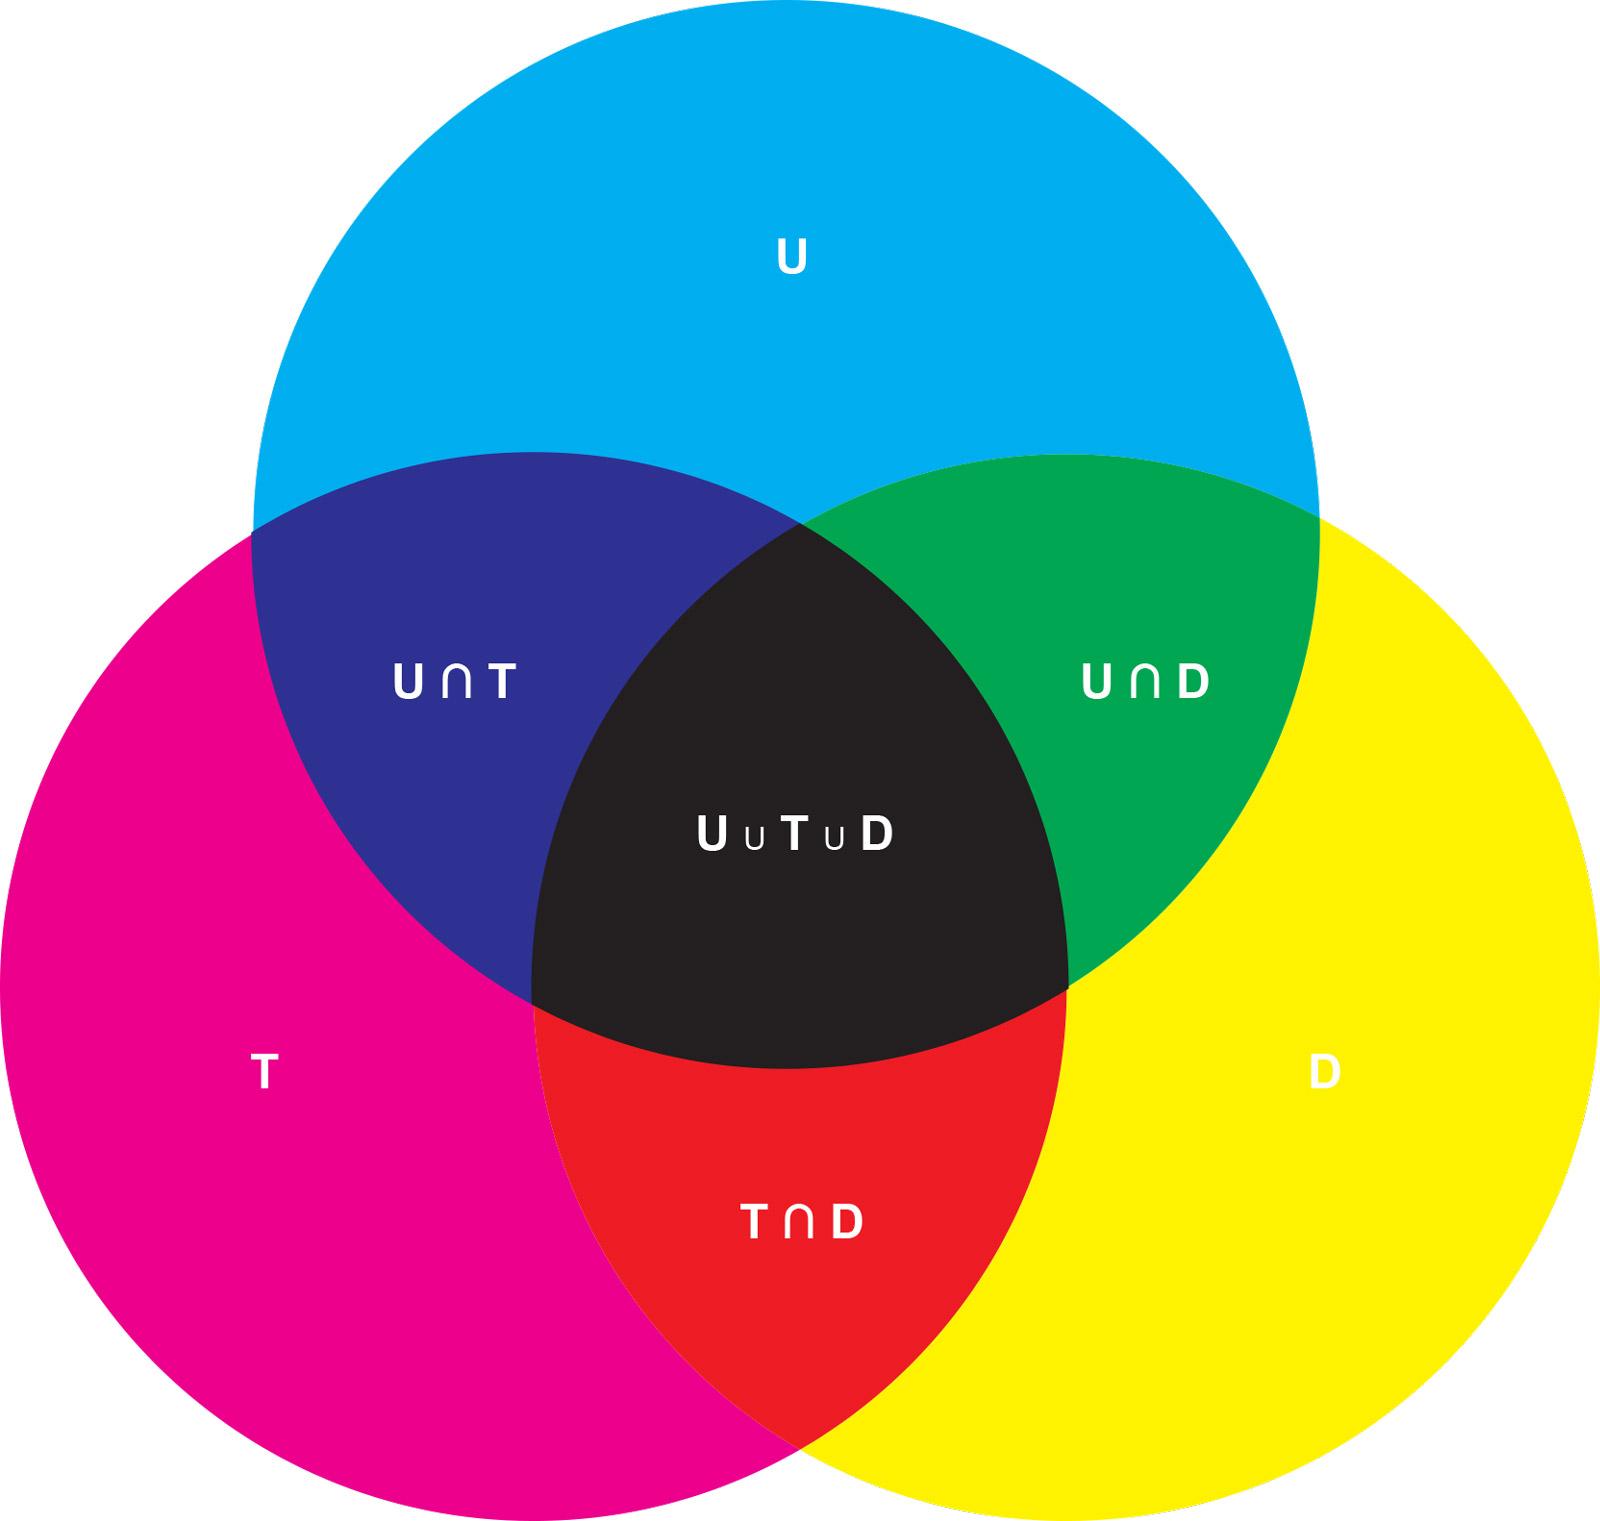 UTD_FIG1